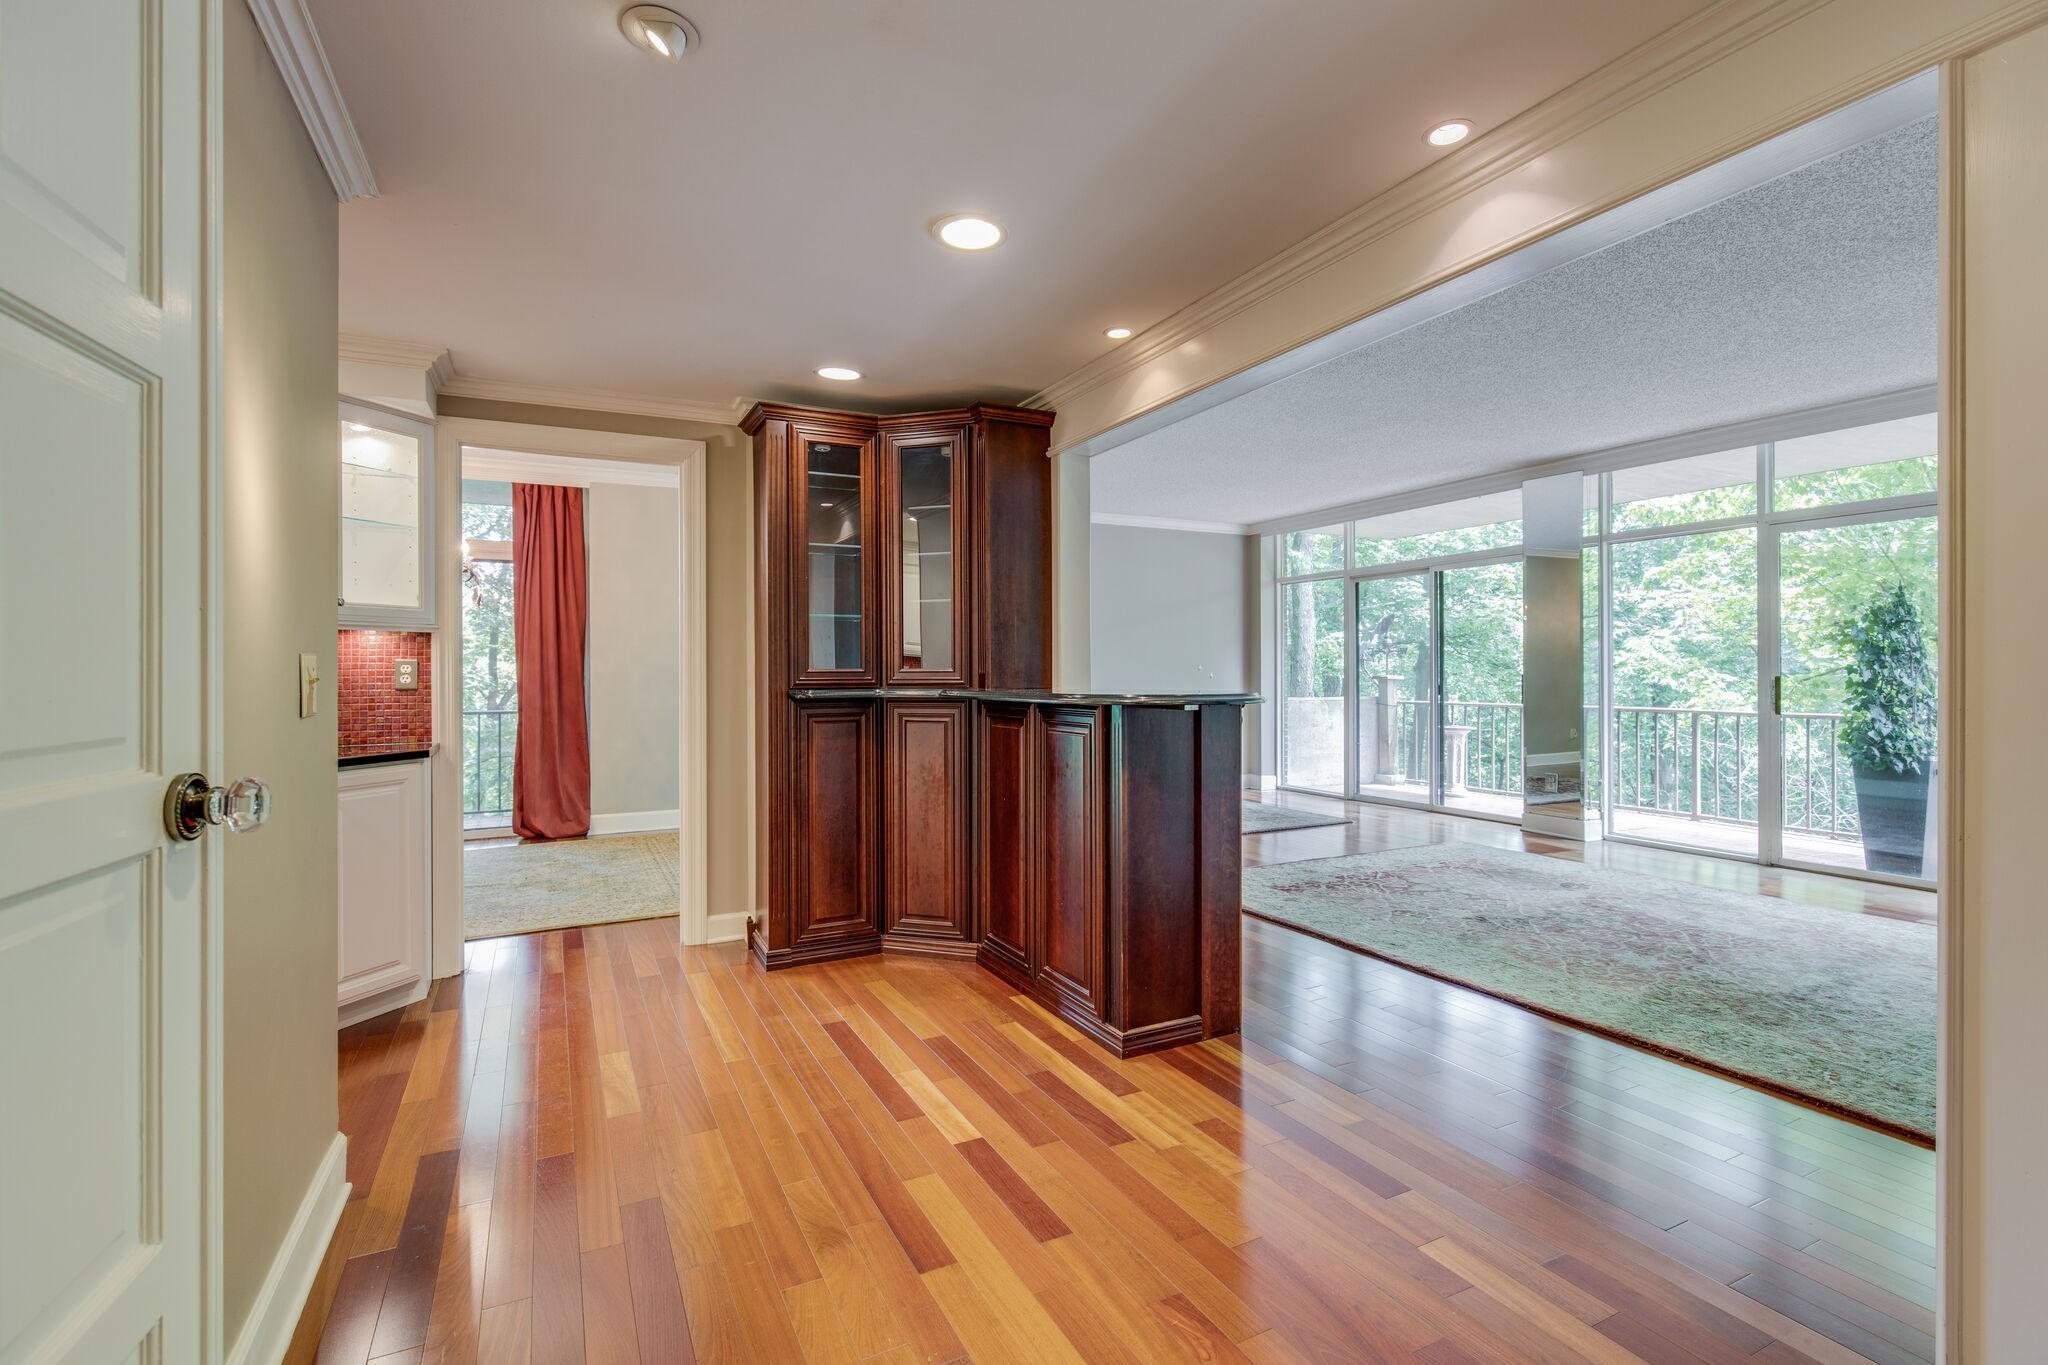 121 Harpeth Trace Smt Property Photo - Nashville, TN real estate listing